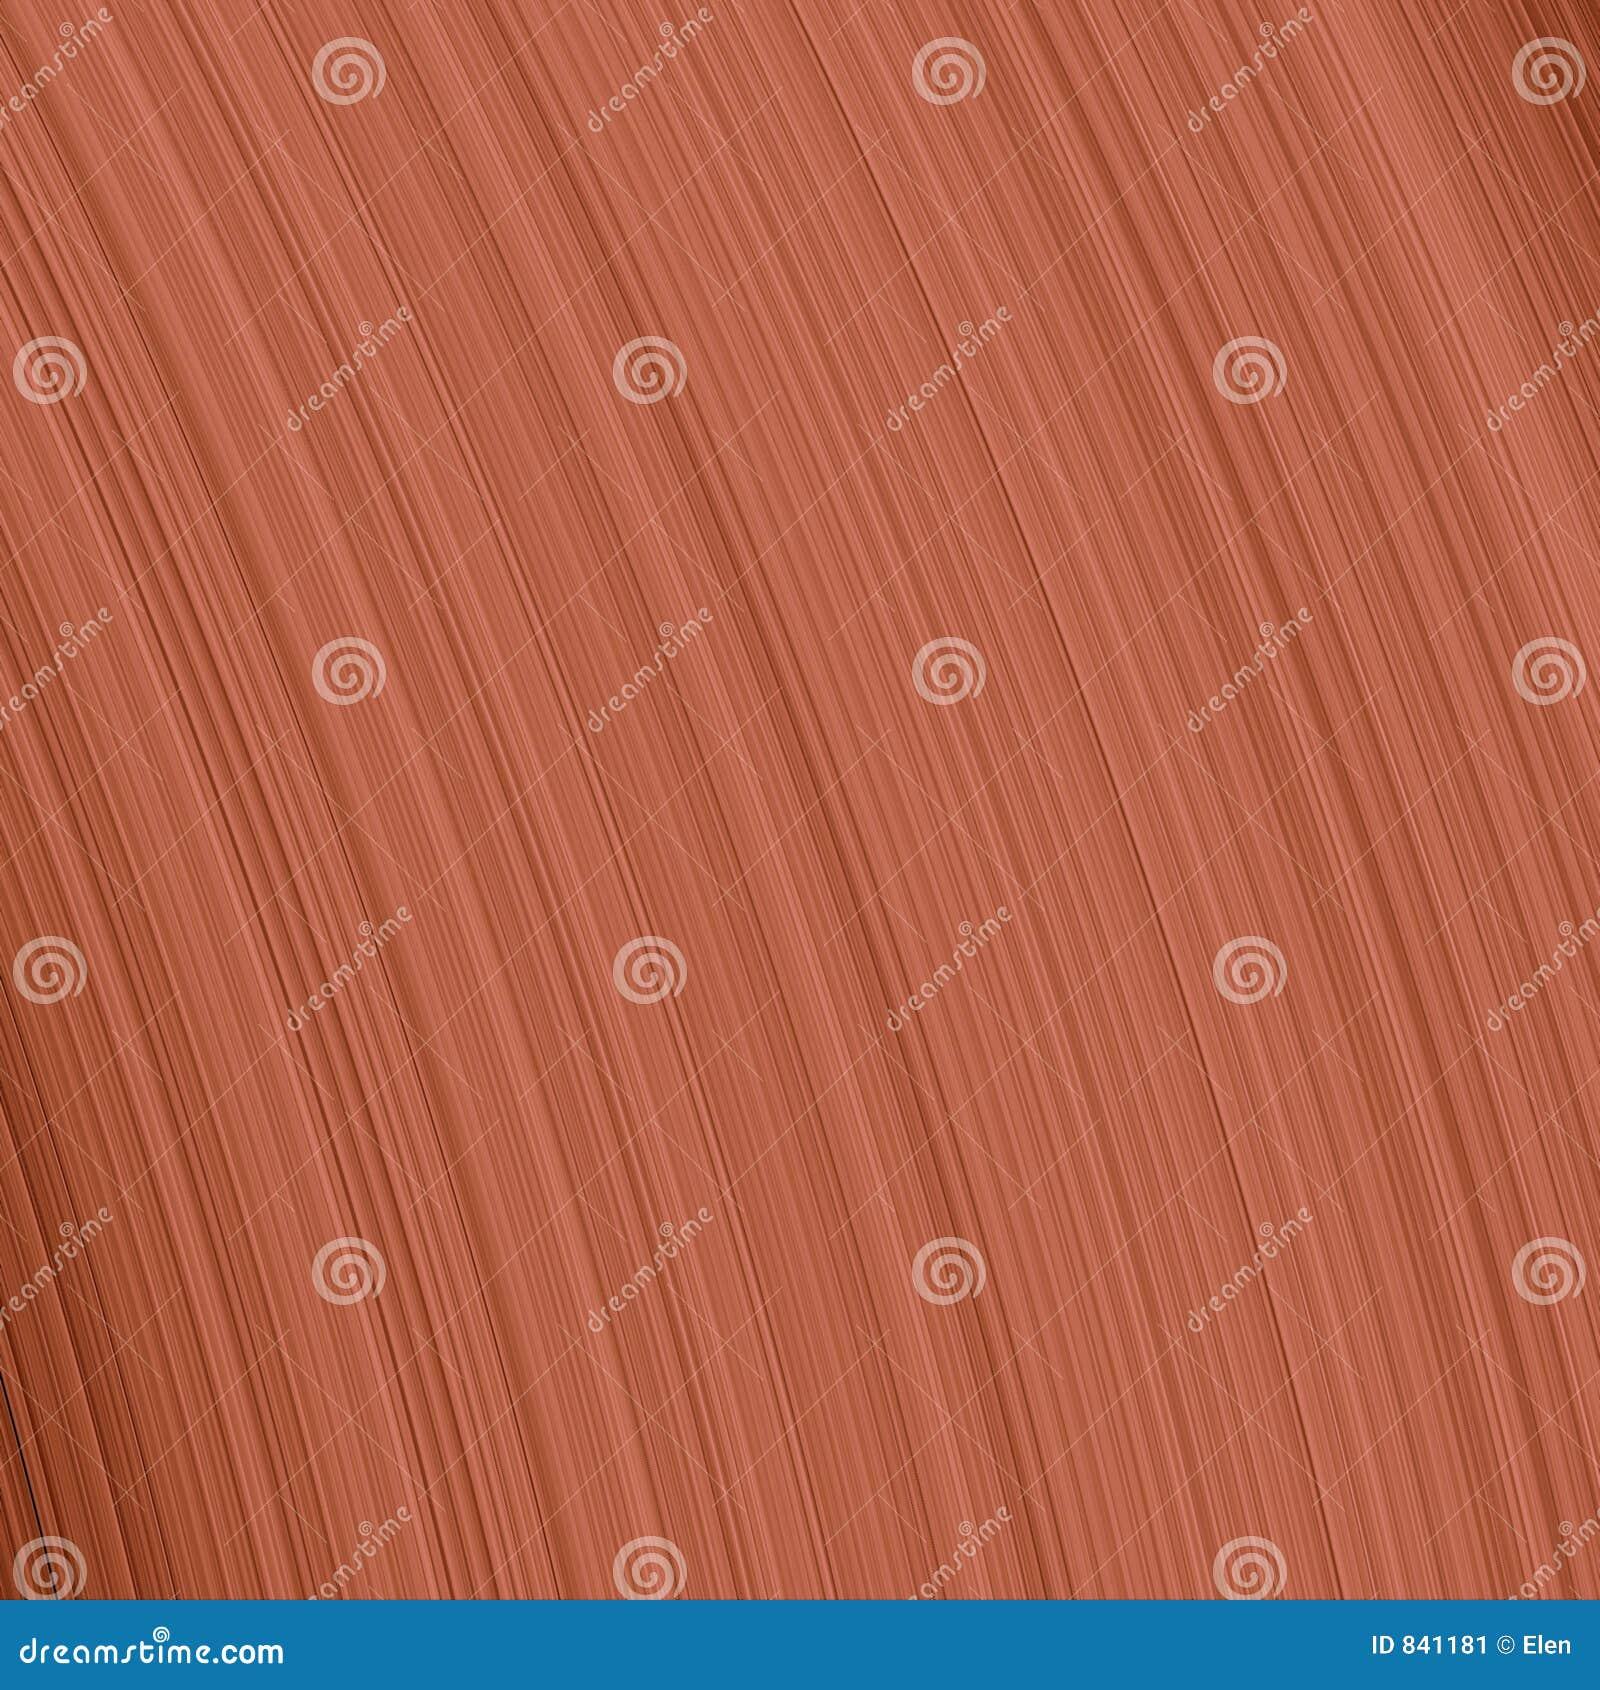 Chestnut hair texture